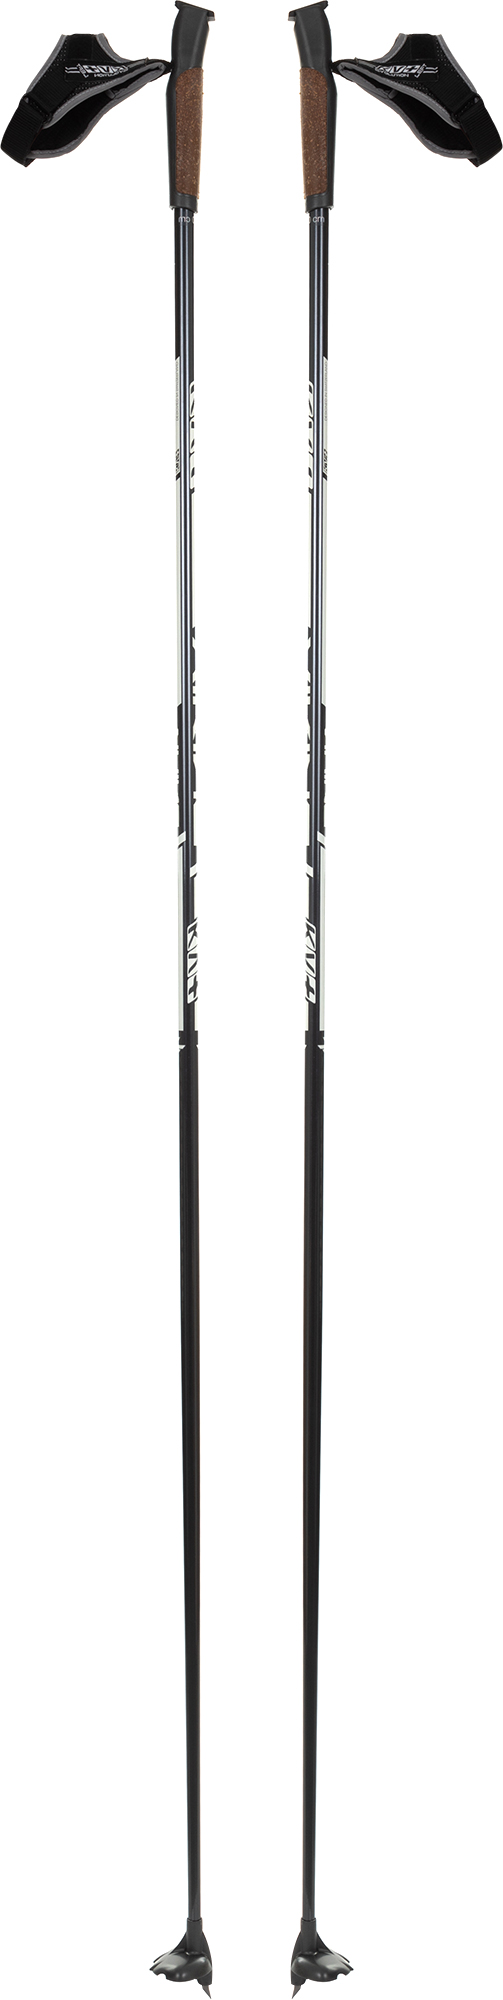 KV+ Палки для беговых лыж Viking